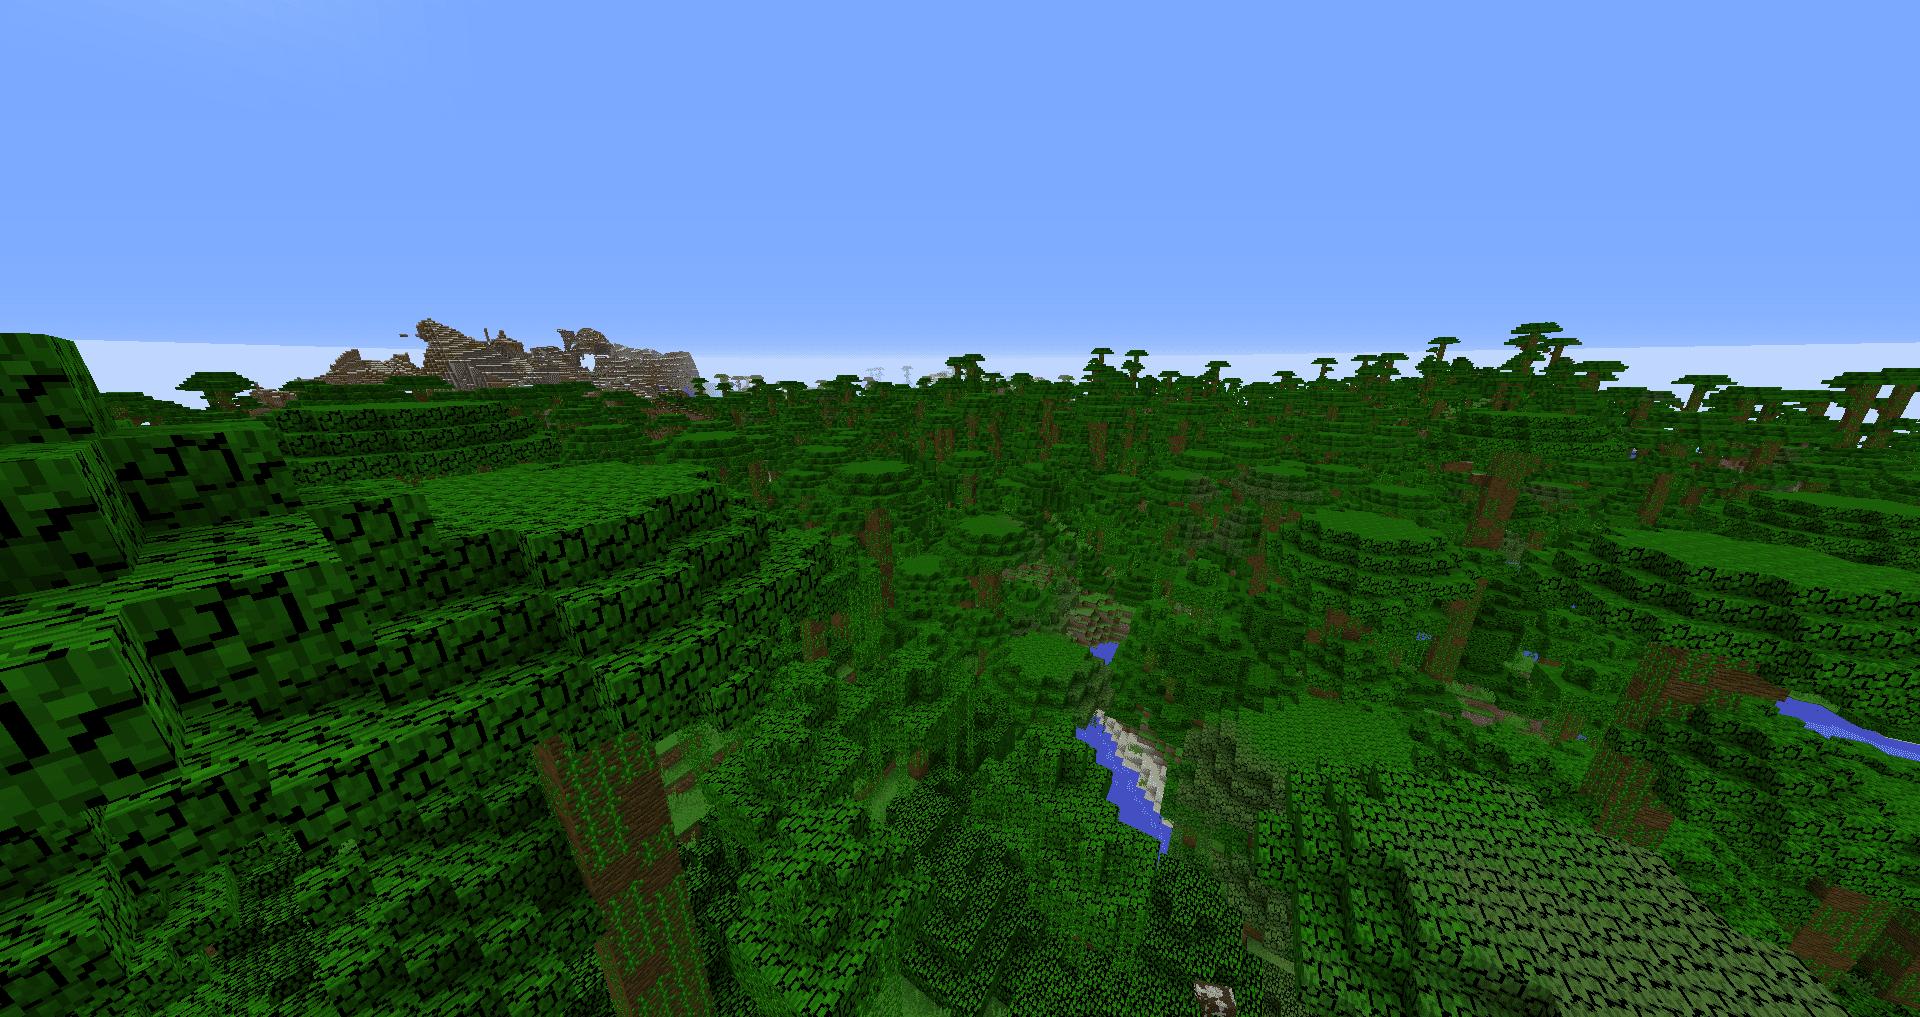 Minecraft Biomes Explained: Jungle Biome